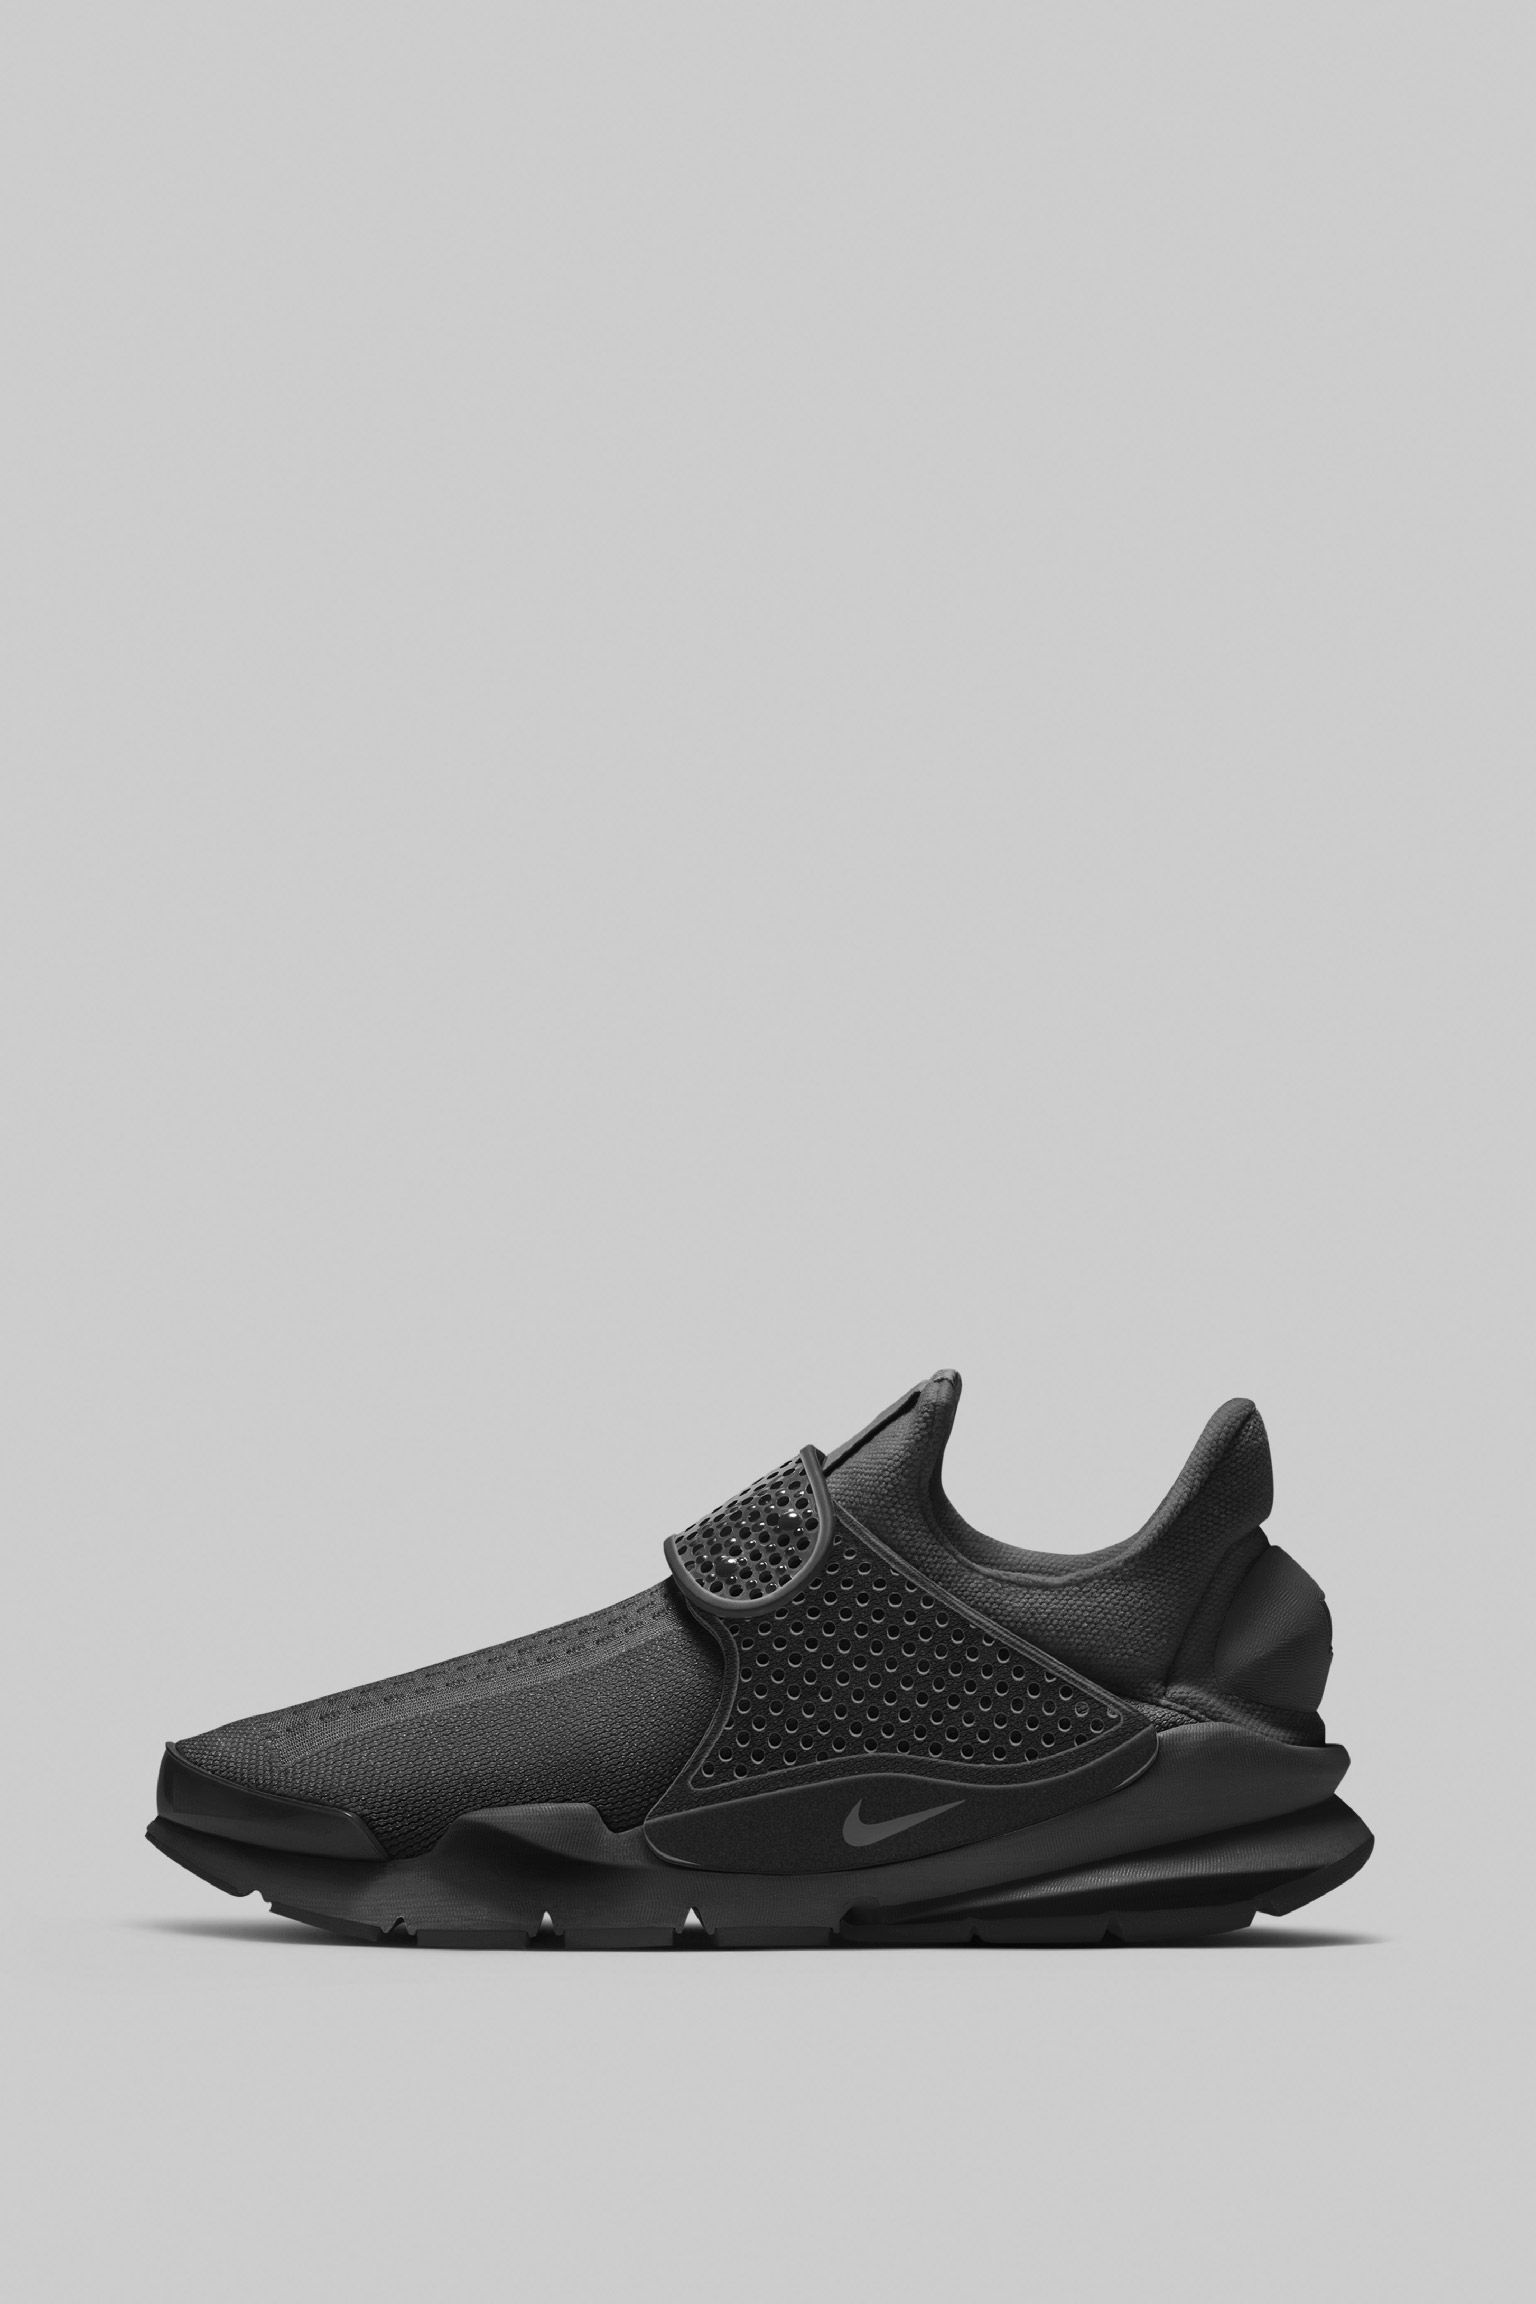 Nike Sock Dart iD 'Be Seen'